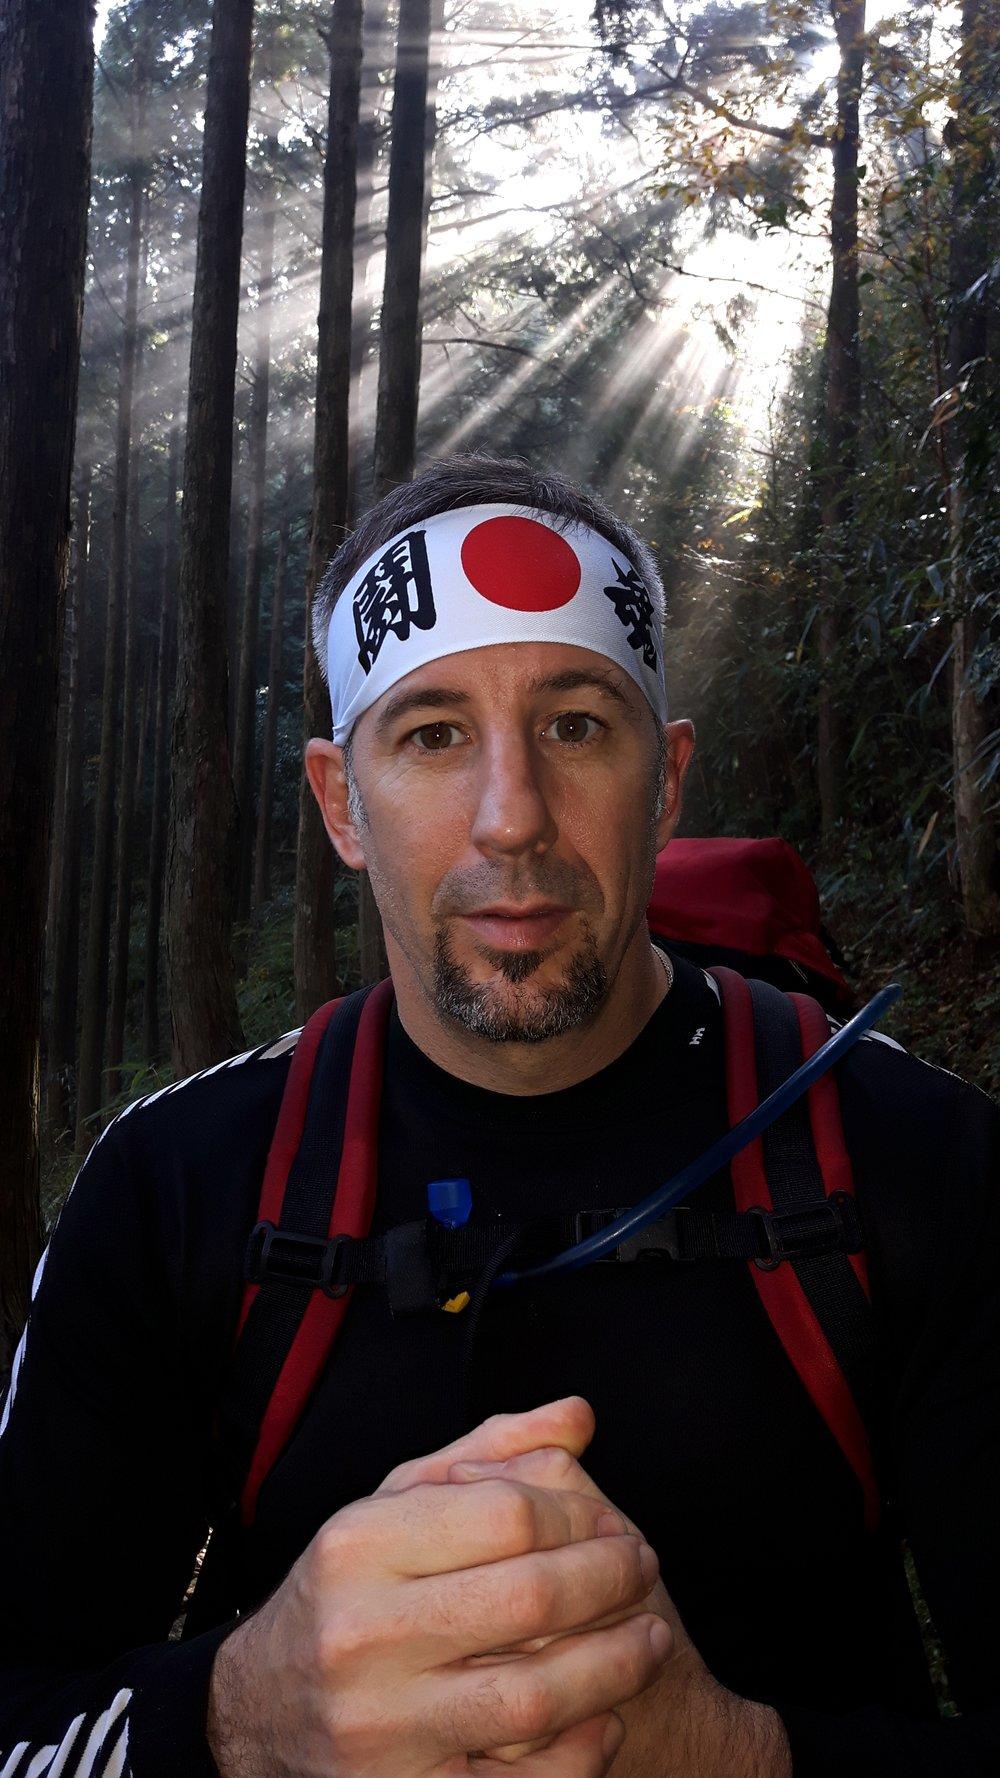 Mark Wood in Japan traversing the 1000 year old Kumano Kodo